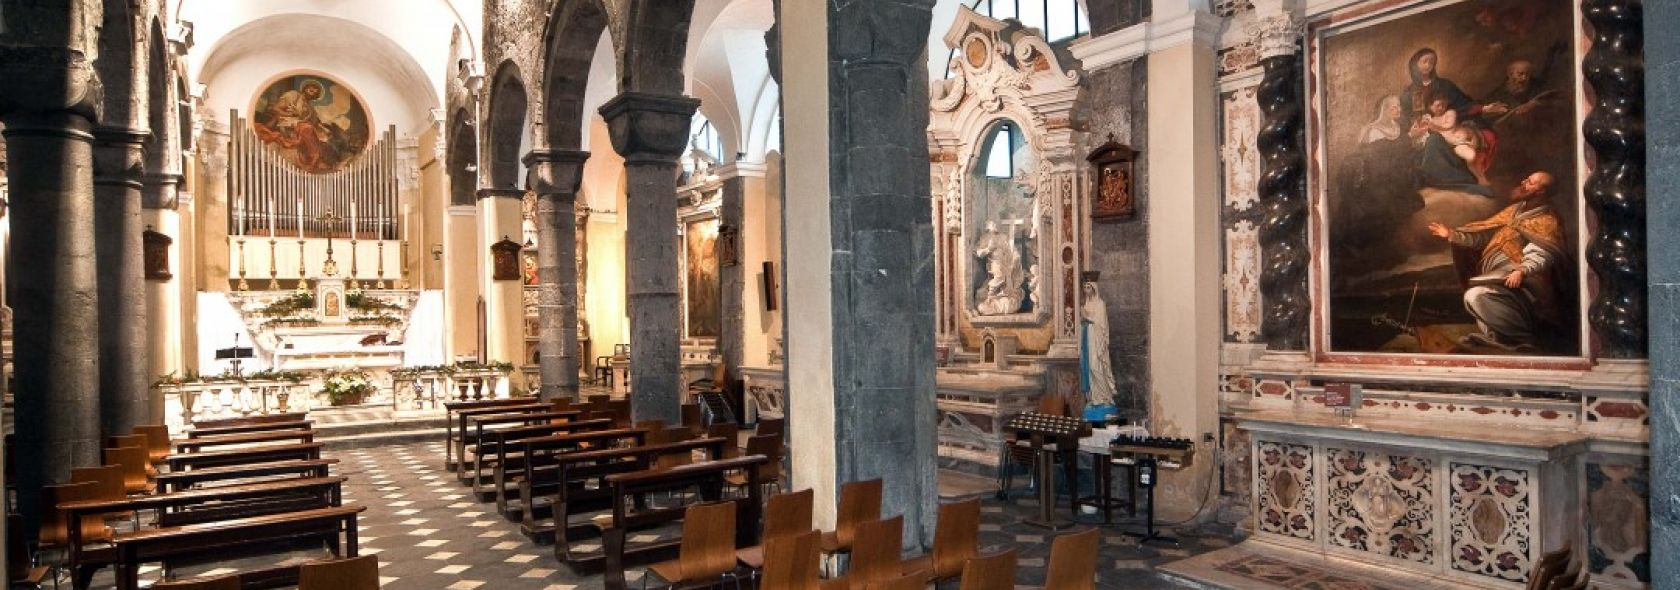 San Marco al Molo foto @ www.museodiocesanogenova.it